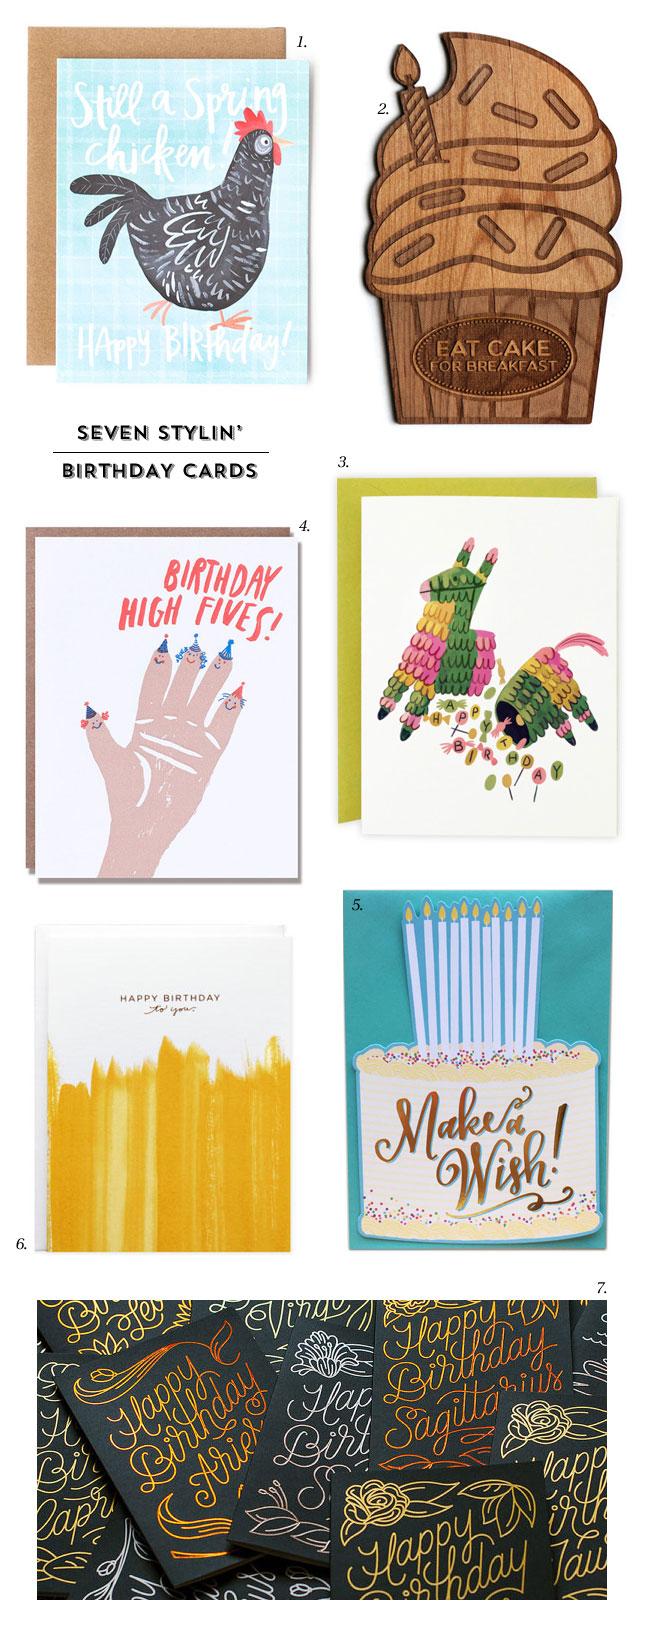 7 Stylin' Happy Birthday Cards